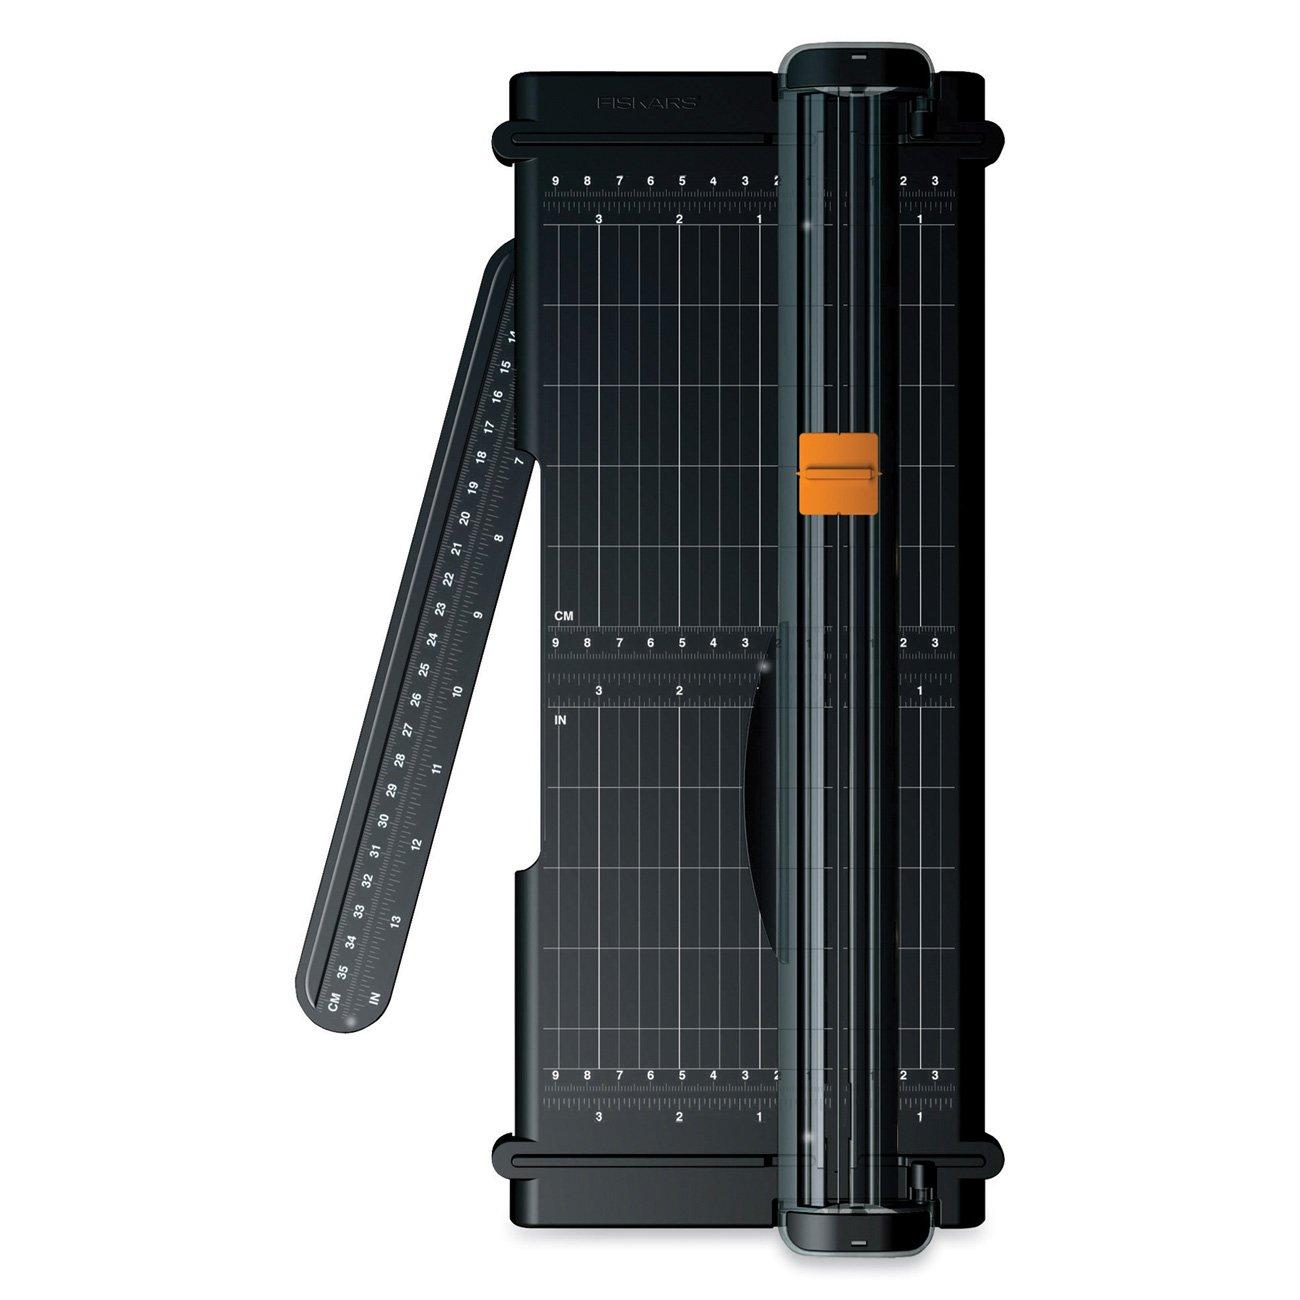 Fiskars SureCut Portable Trimmer with Recycled Cutline, 12 Inch Cut, Black by Fiskars